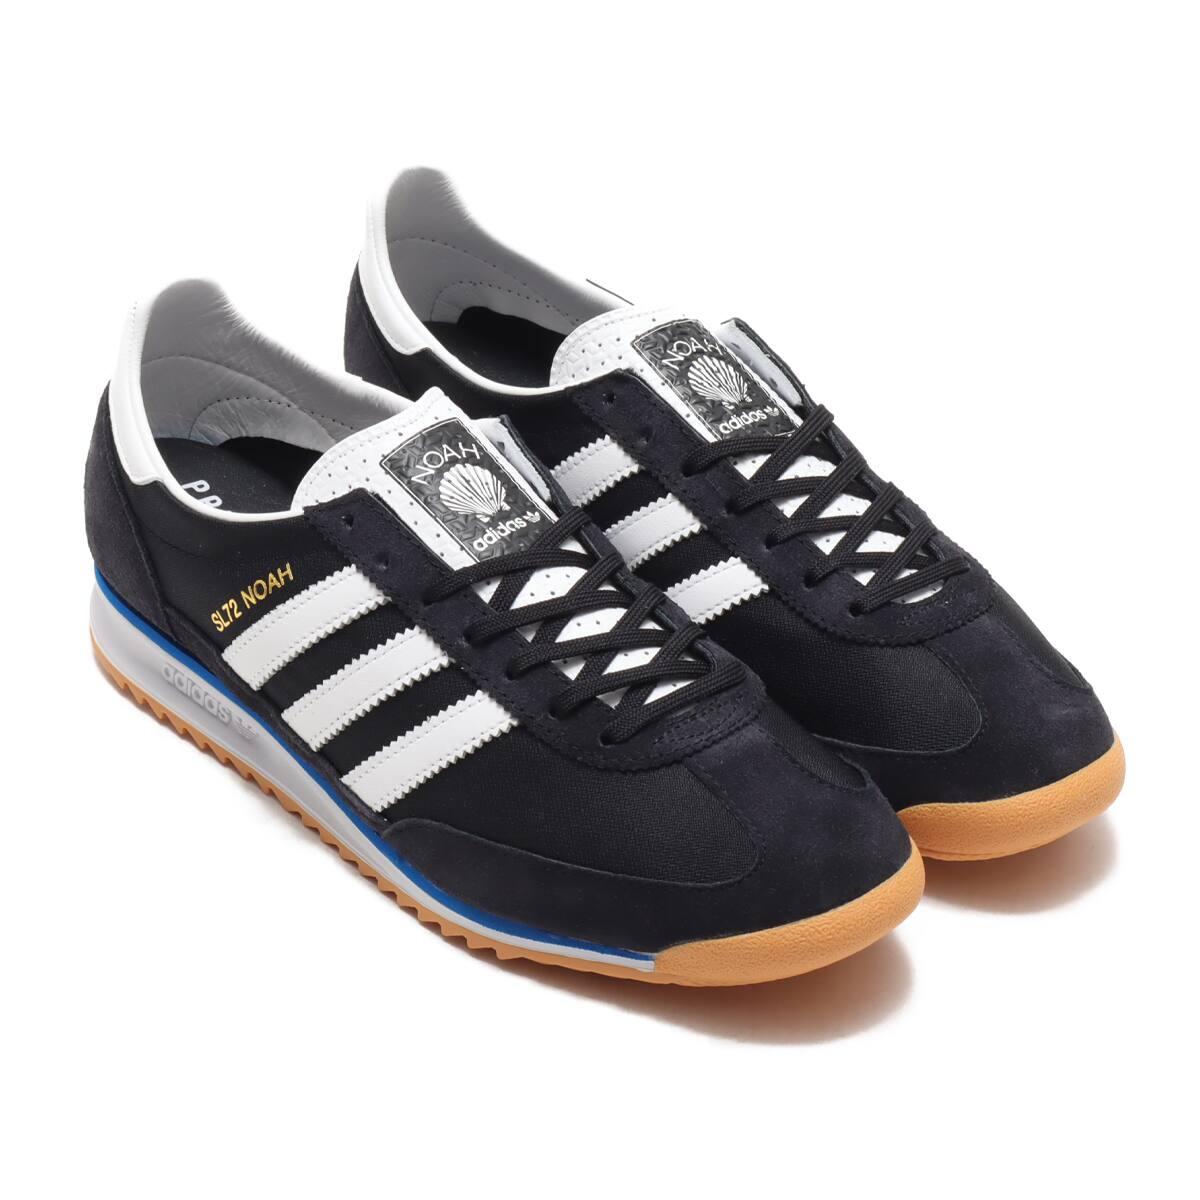 adidas SL72 NOAH CORE BLACK/CORE WHITE/BLUE 20SS-I_photo_large